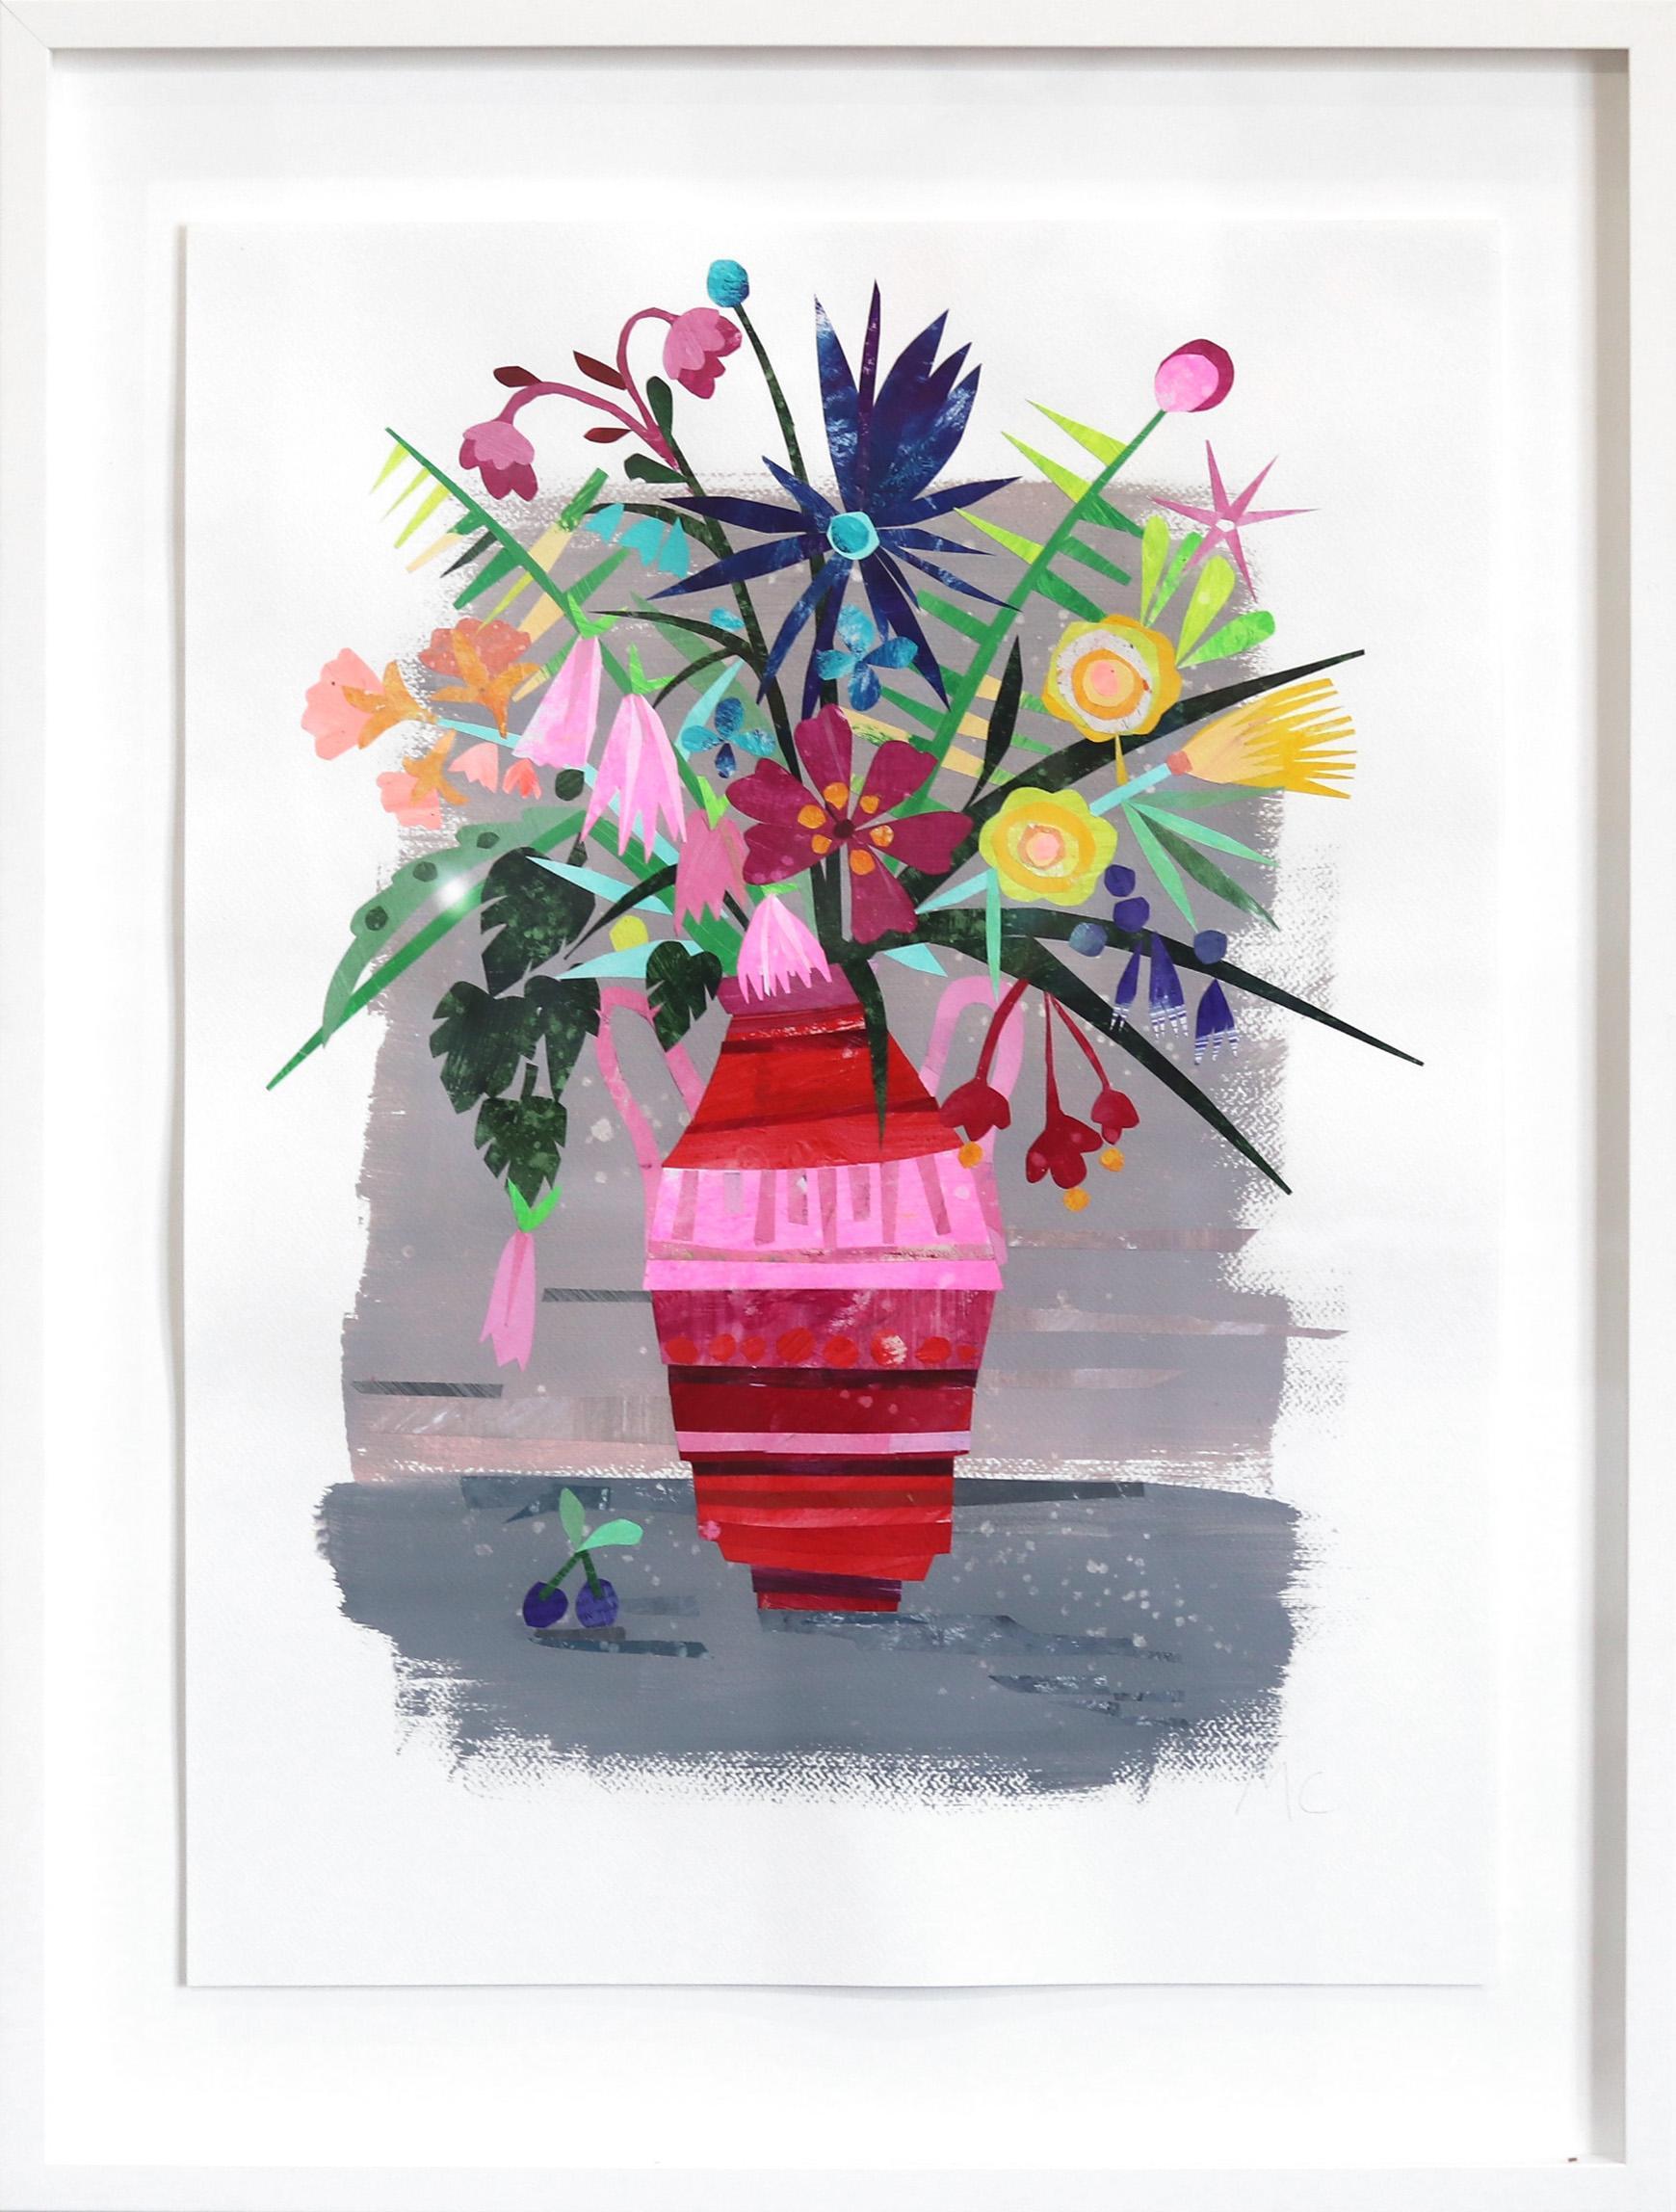 Garden Flowers - Original Watercolor Mixed Media Artwork (Framed)